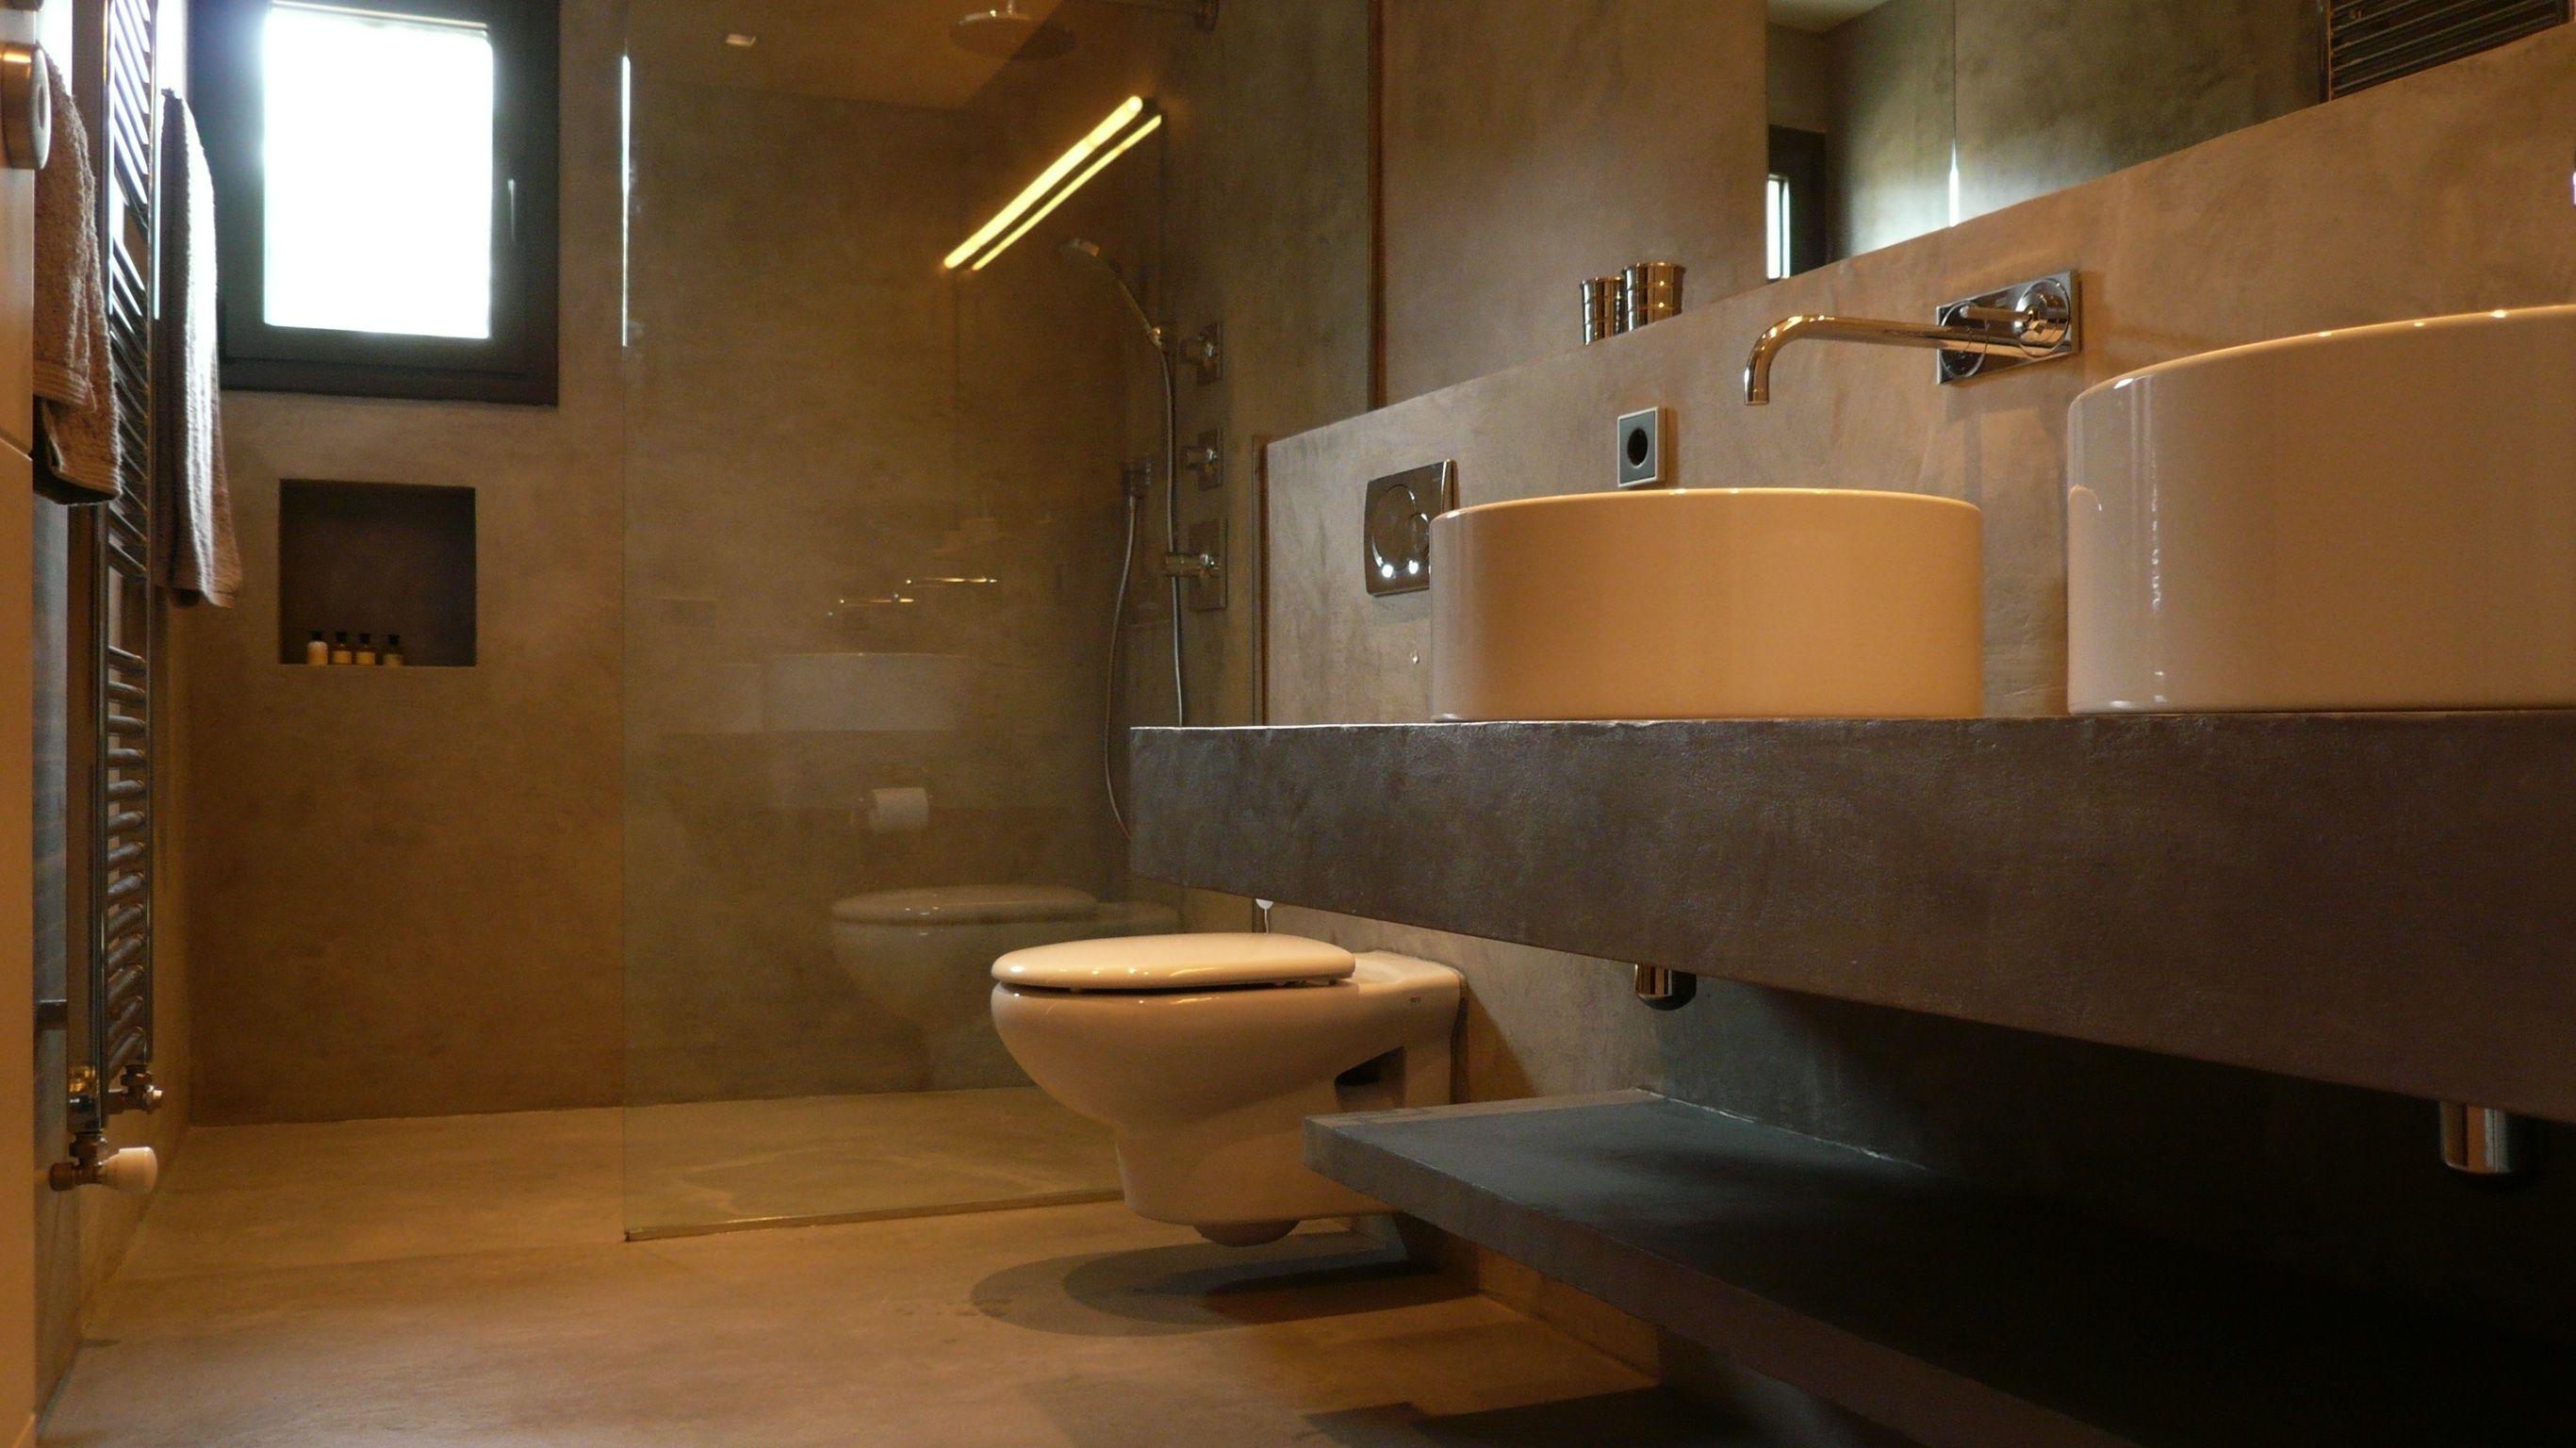 baños con microcemento - Buscar con Google   wc lavabos   Pinterest ...